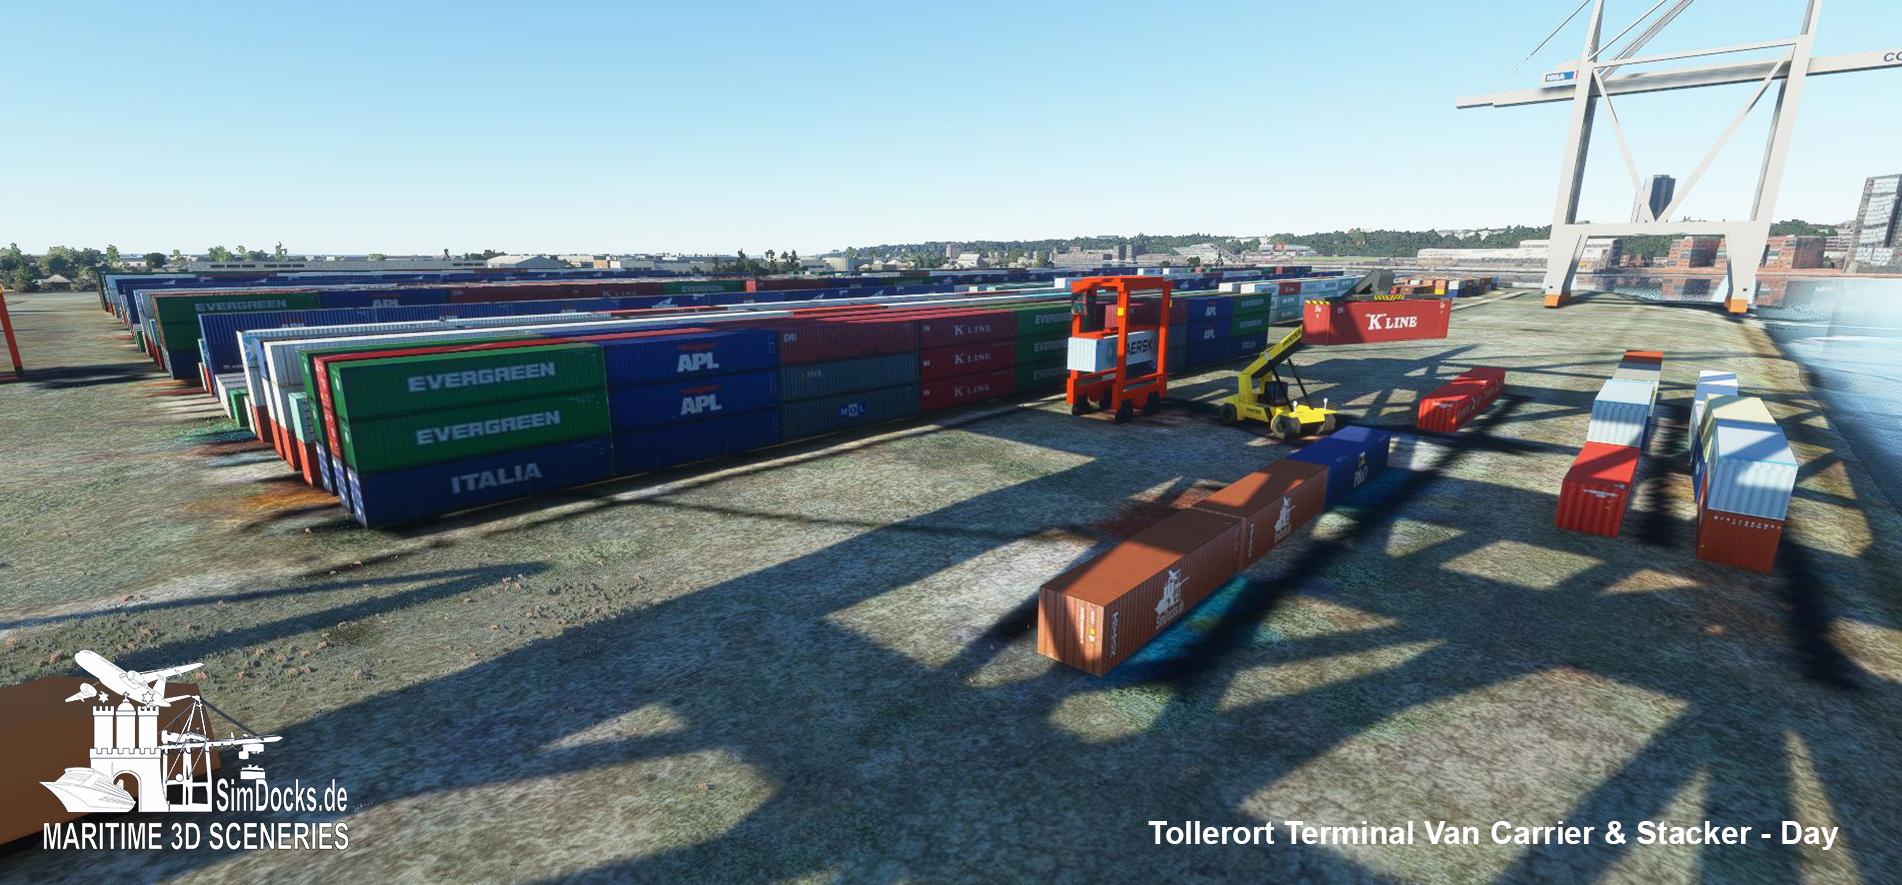 Bild16_Terminal_Tollerort_Container-Vans_Tag.JPG